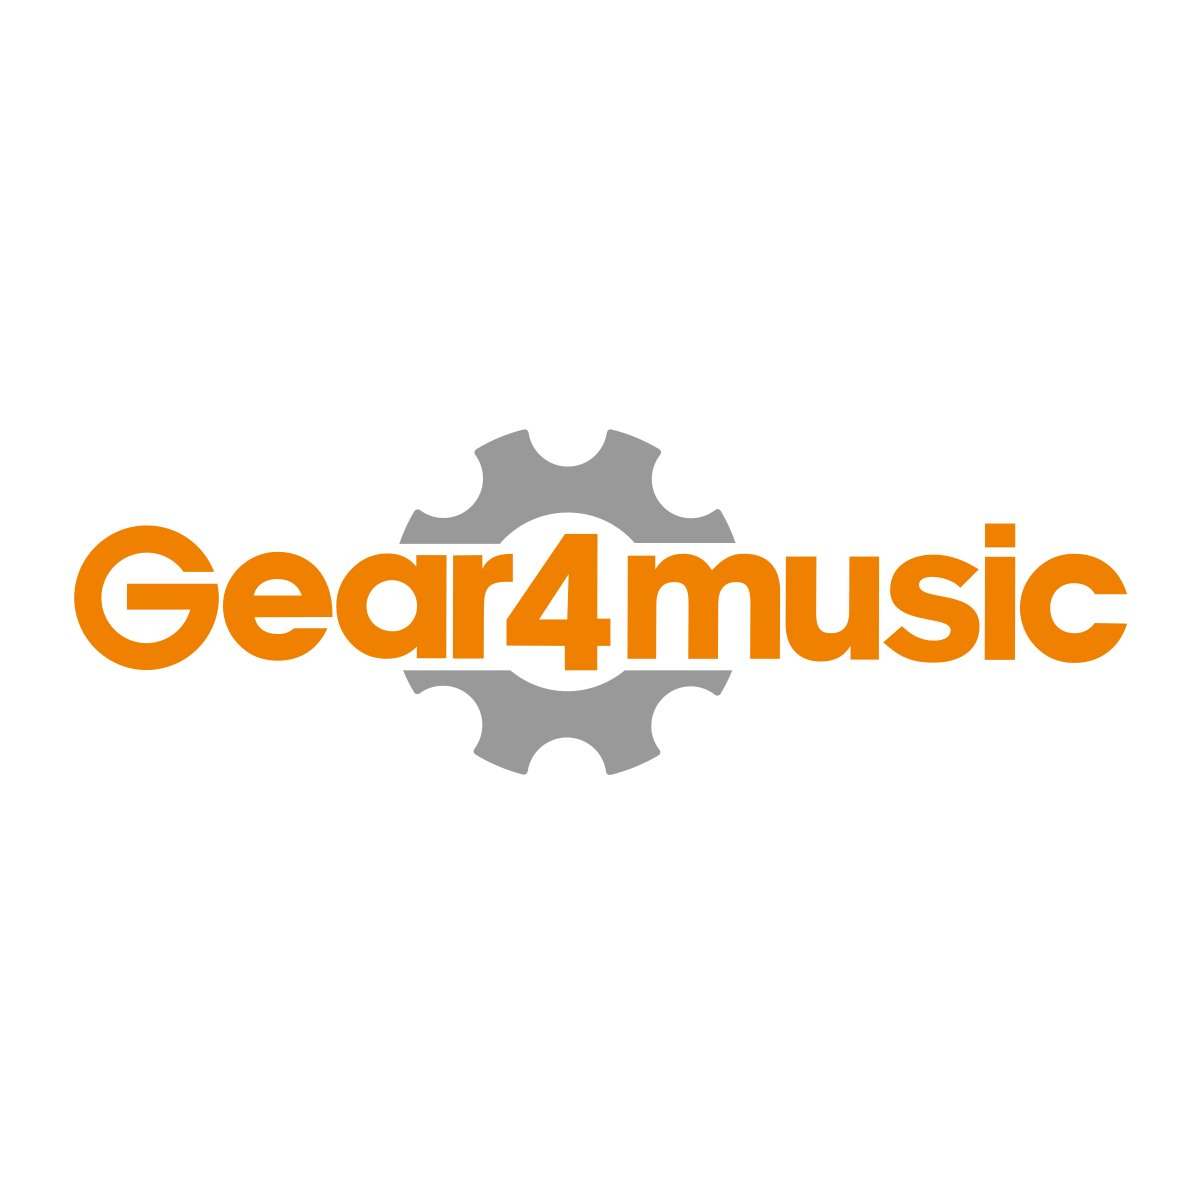 Remo Ocean Drum 2.5\'\' x 12\'\', White bei Gear4music